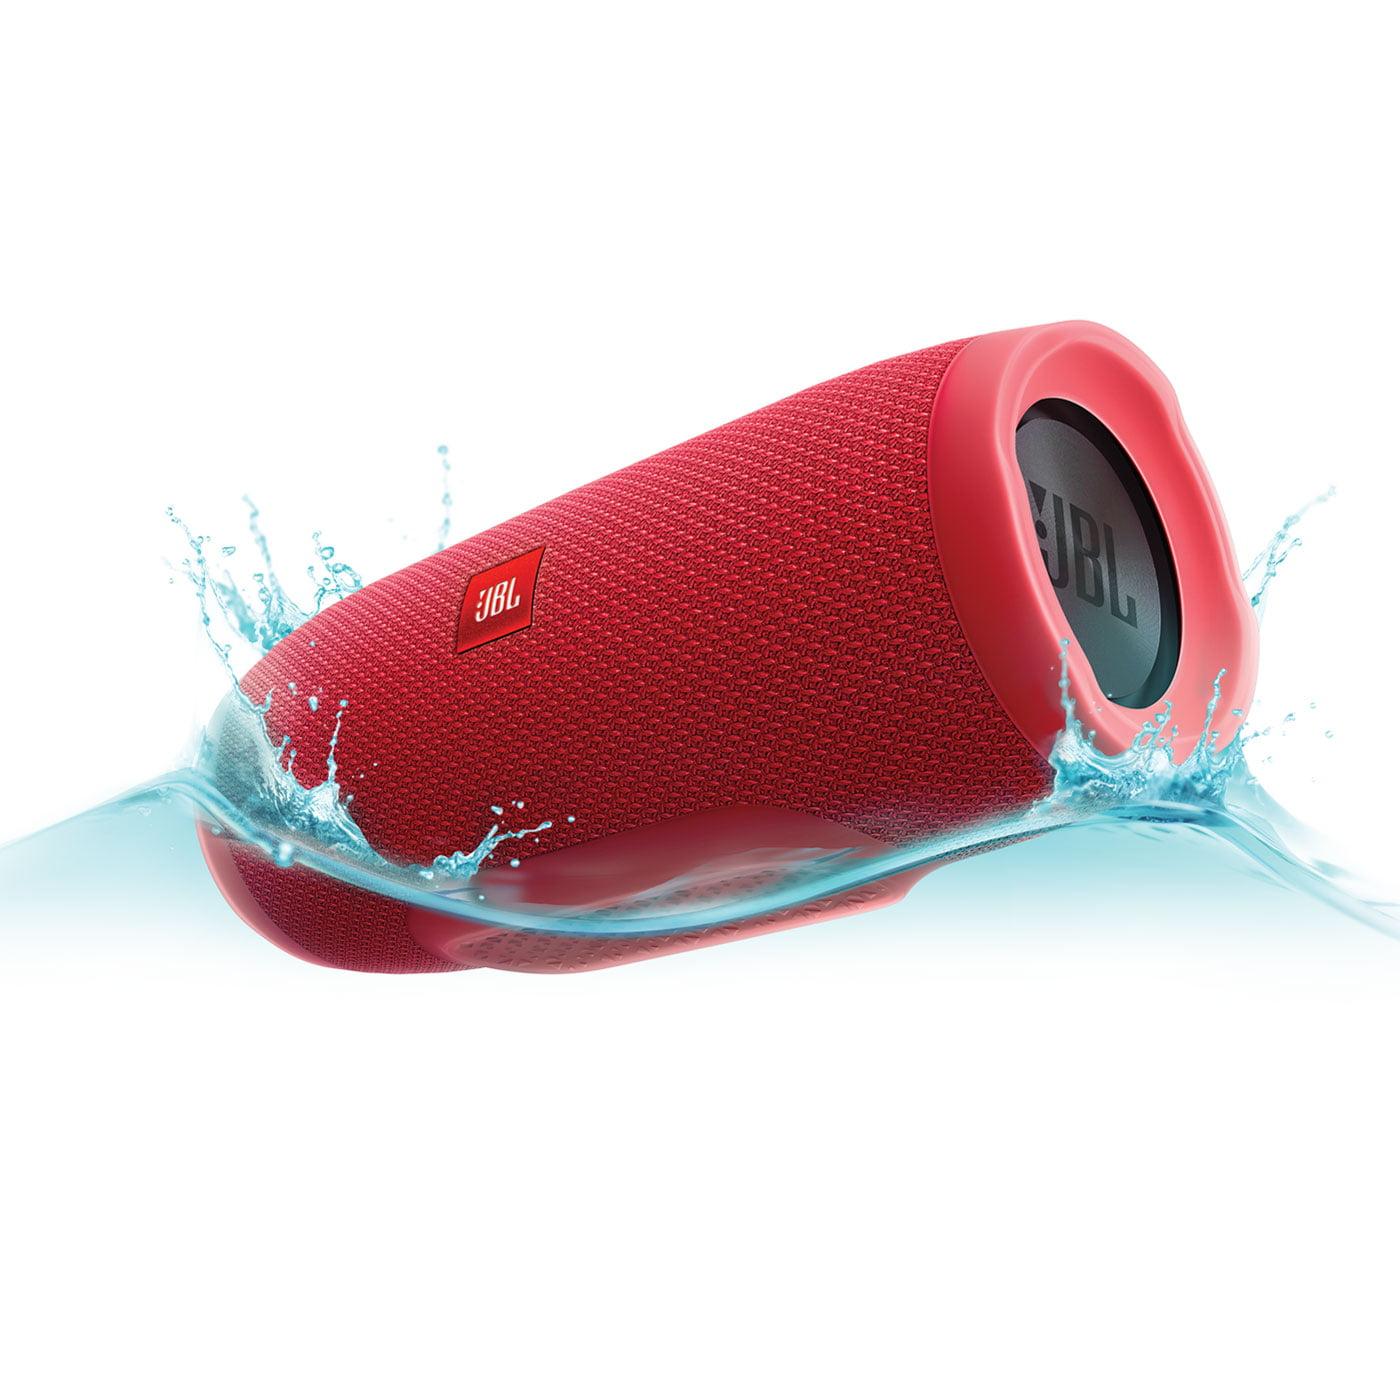 JBL Charge 10 Waterproof Portable Bluetooth Speaker - Walmart.com